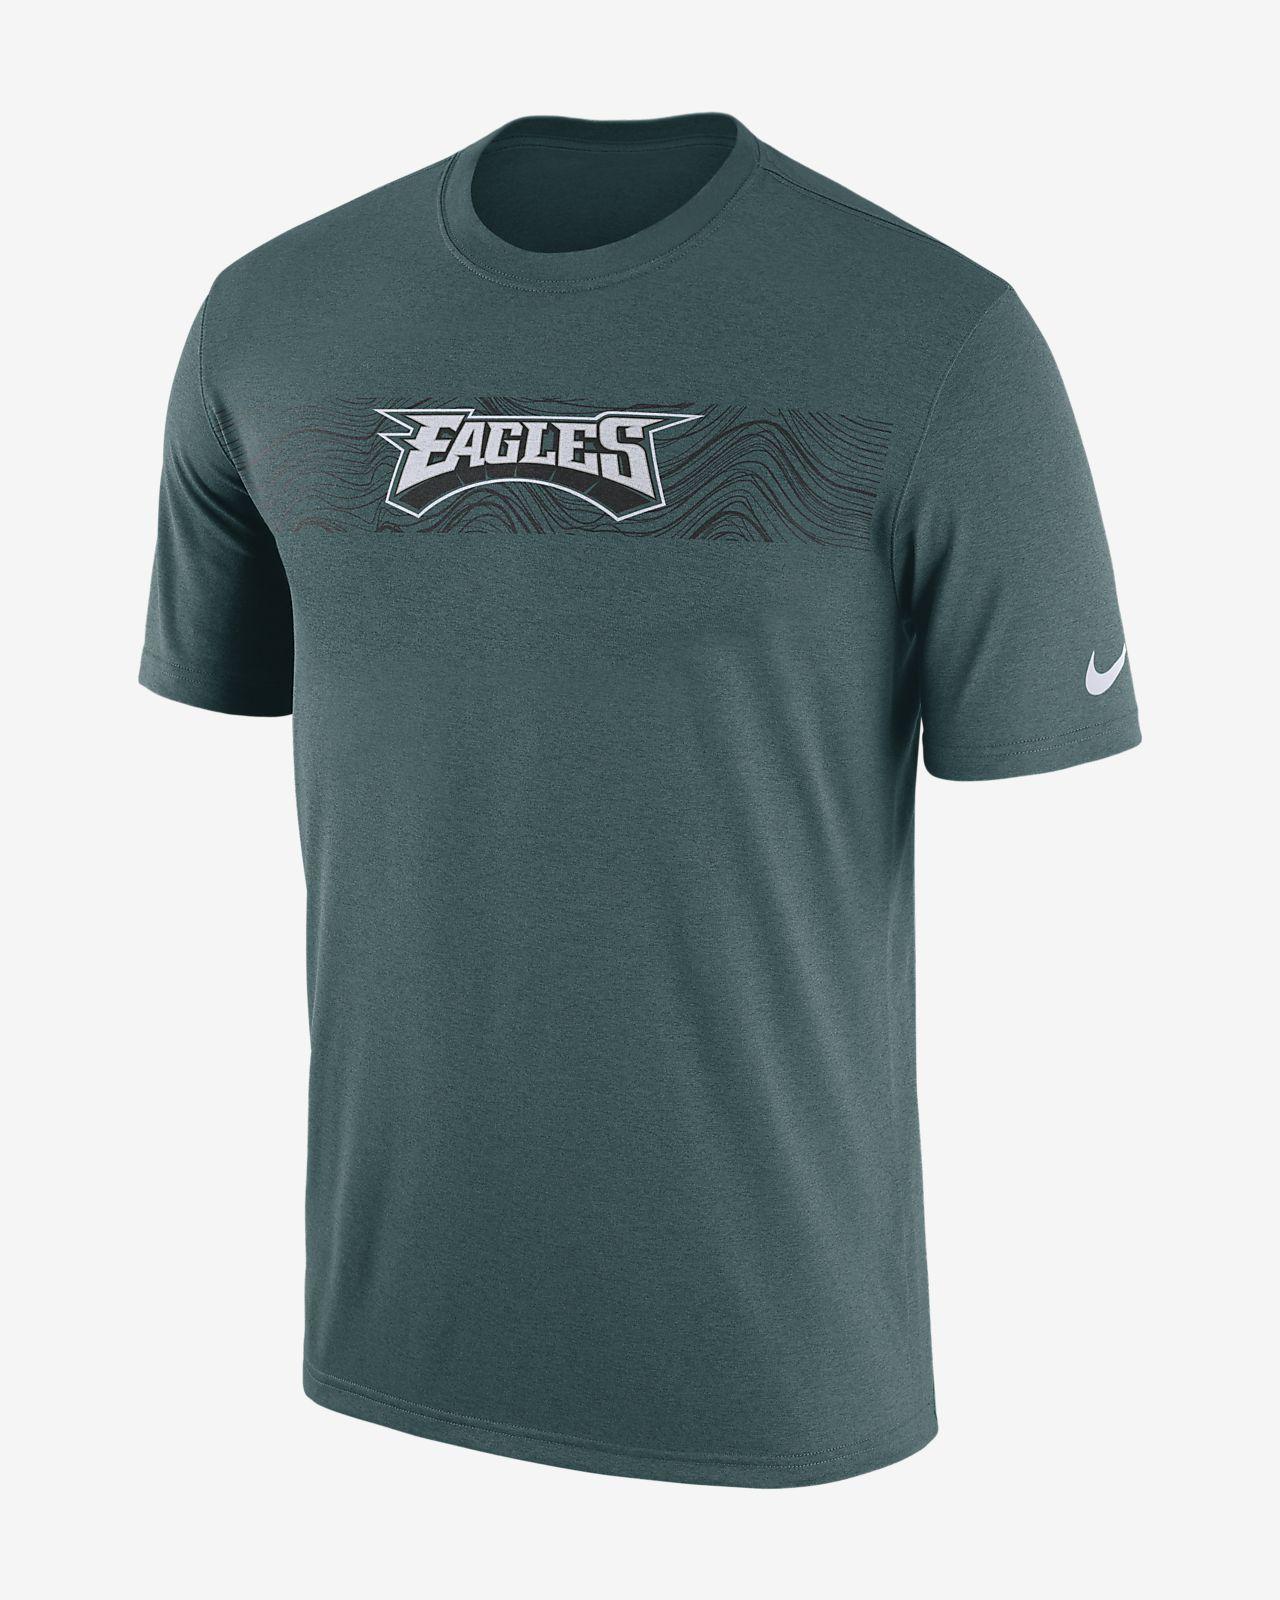 63377bae Nike Dri-FIT Legend Seismic (NFL Eagles) Men's T-Shirt. Nike.com